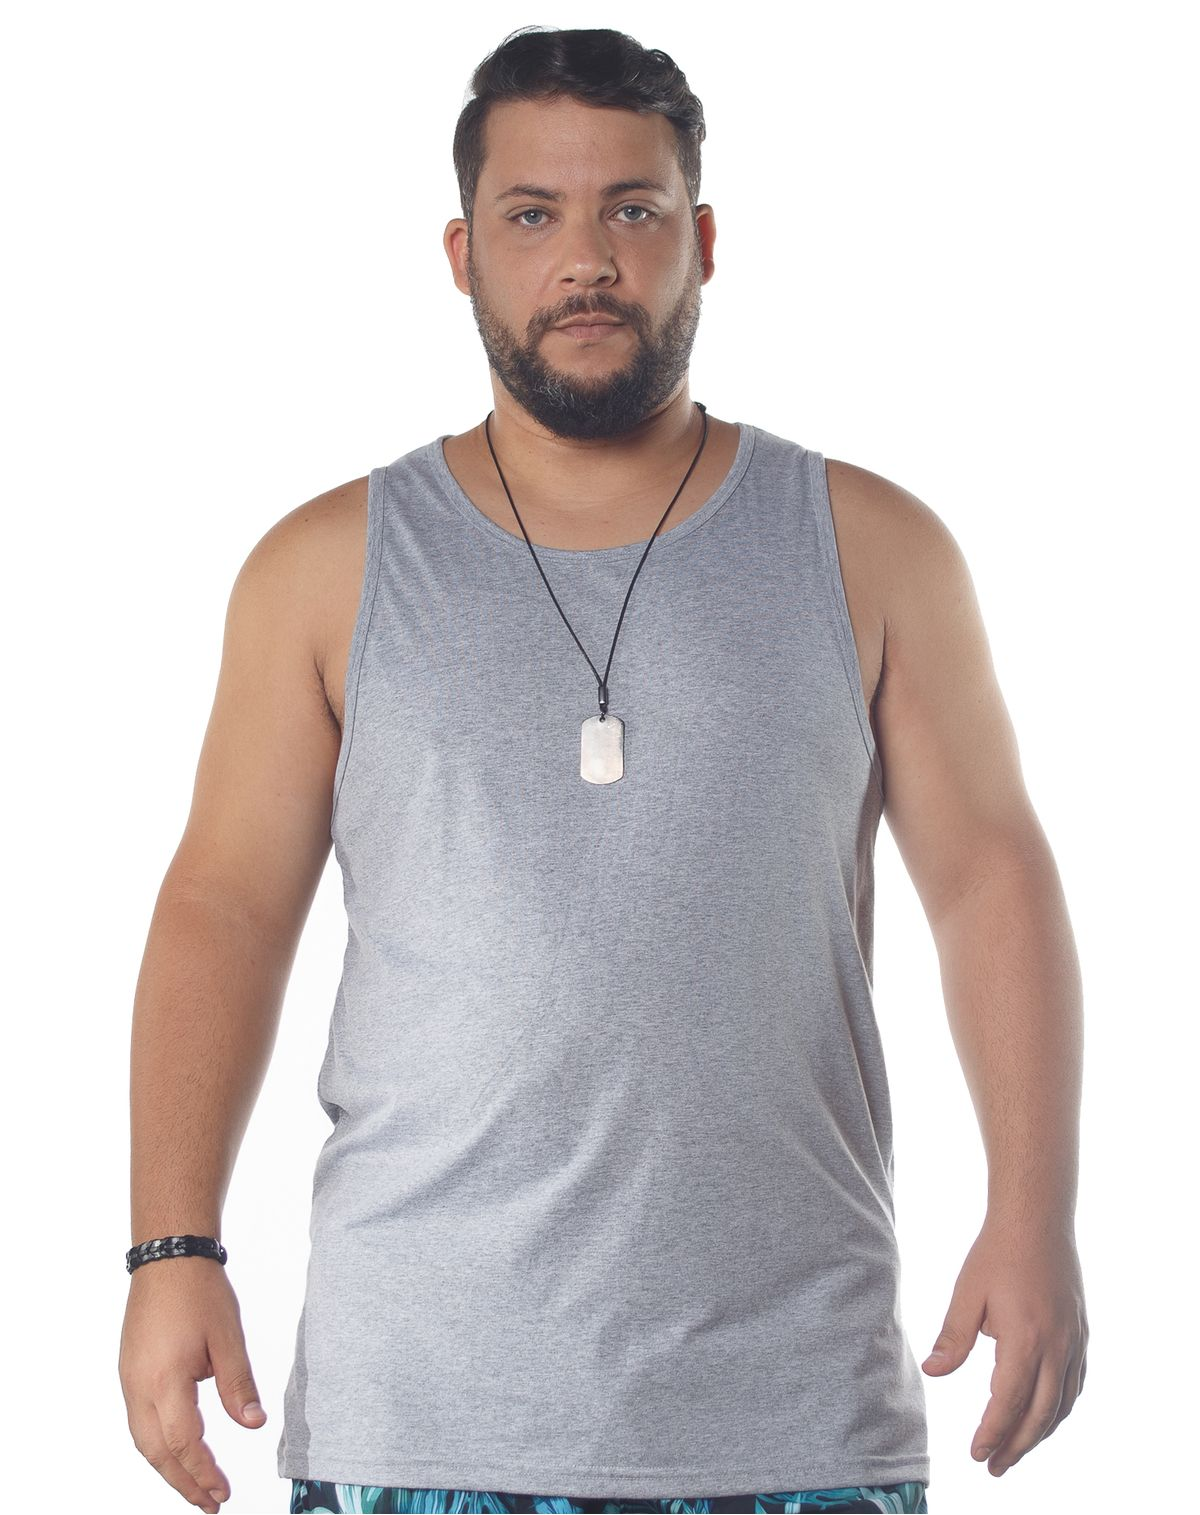 575323004-regata-basica-plus-masculina-mescla-claro-g1-197